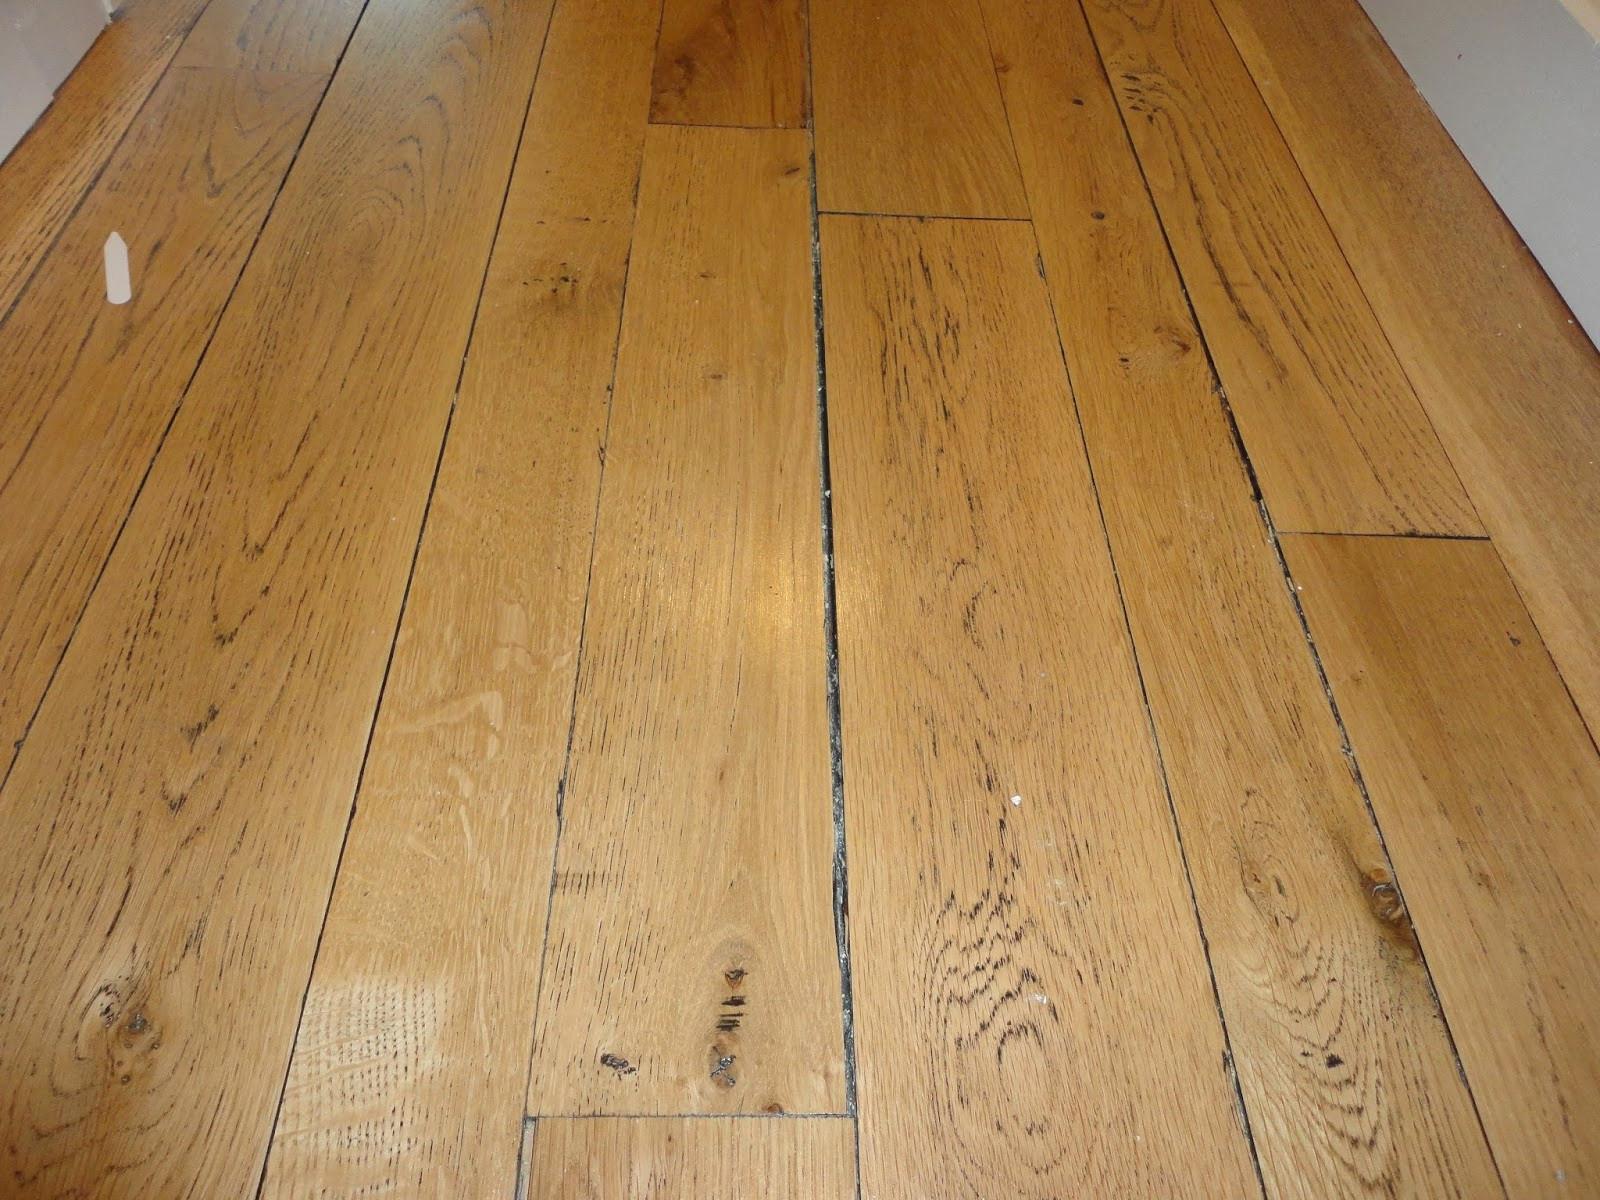 lm engineered hardwood flooring reviews of white washed engineered wood flooring can you whitewash engineered for 39 beautiful white wash wood floors home idea